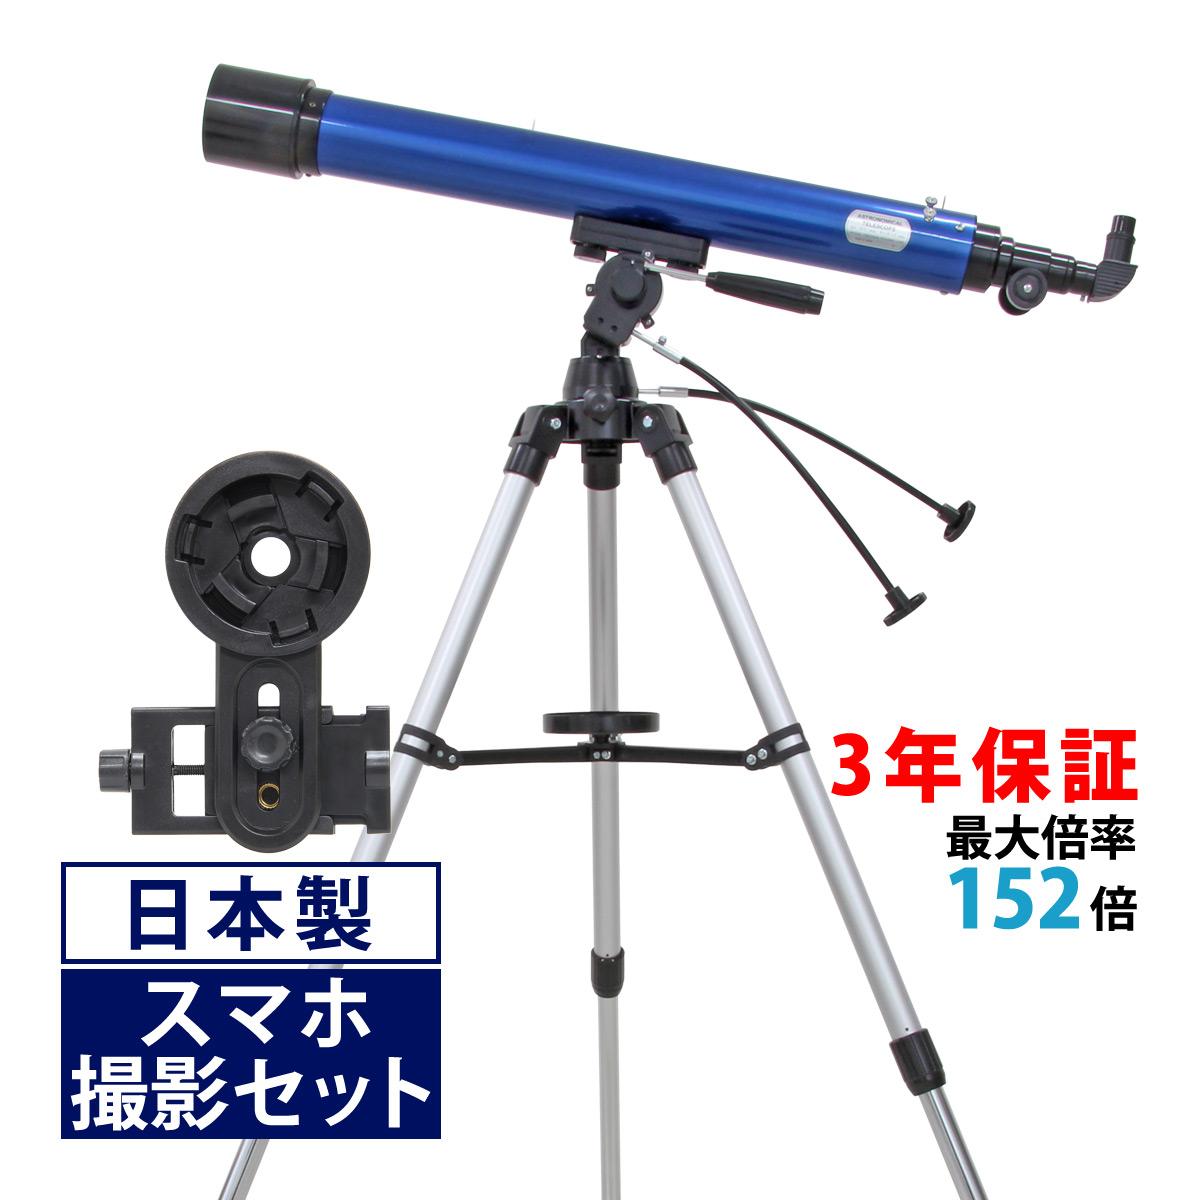 天体望遠鏡 スマホ 小学生 リゲル80 日本製 子供用